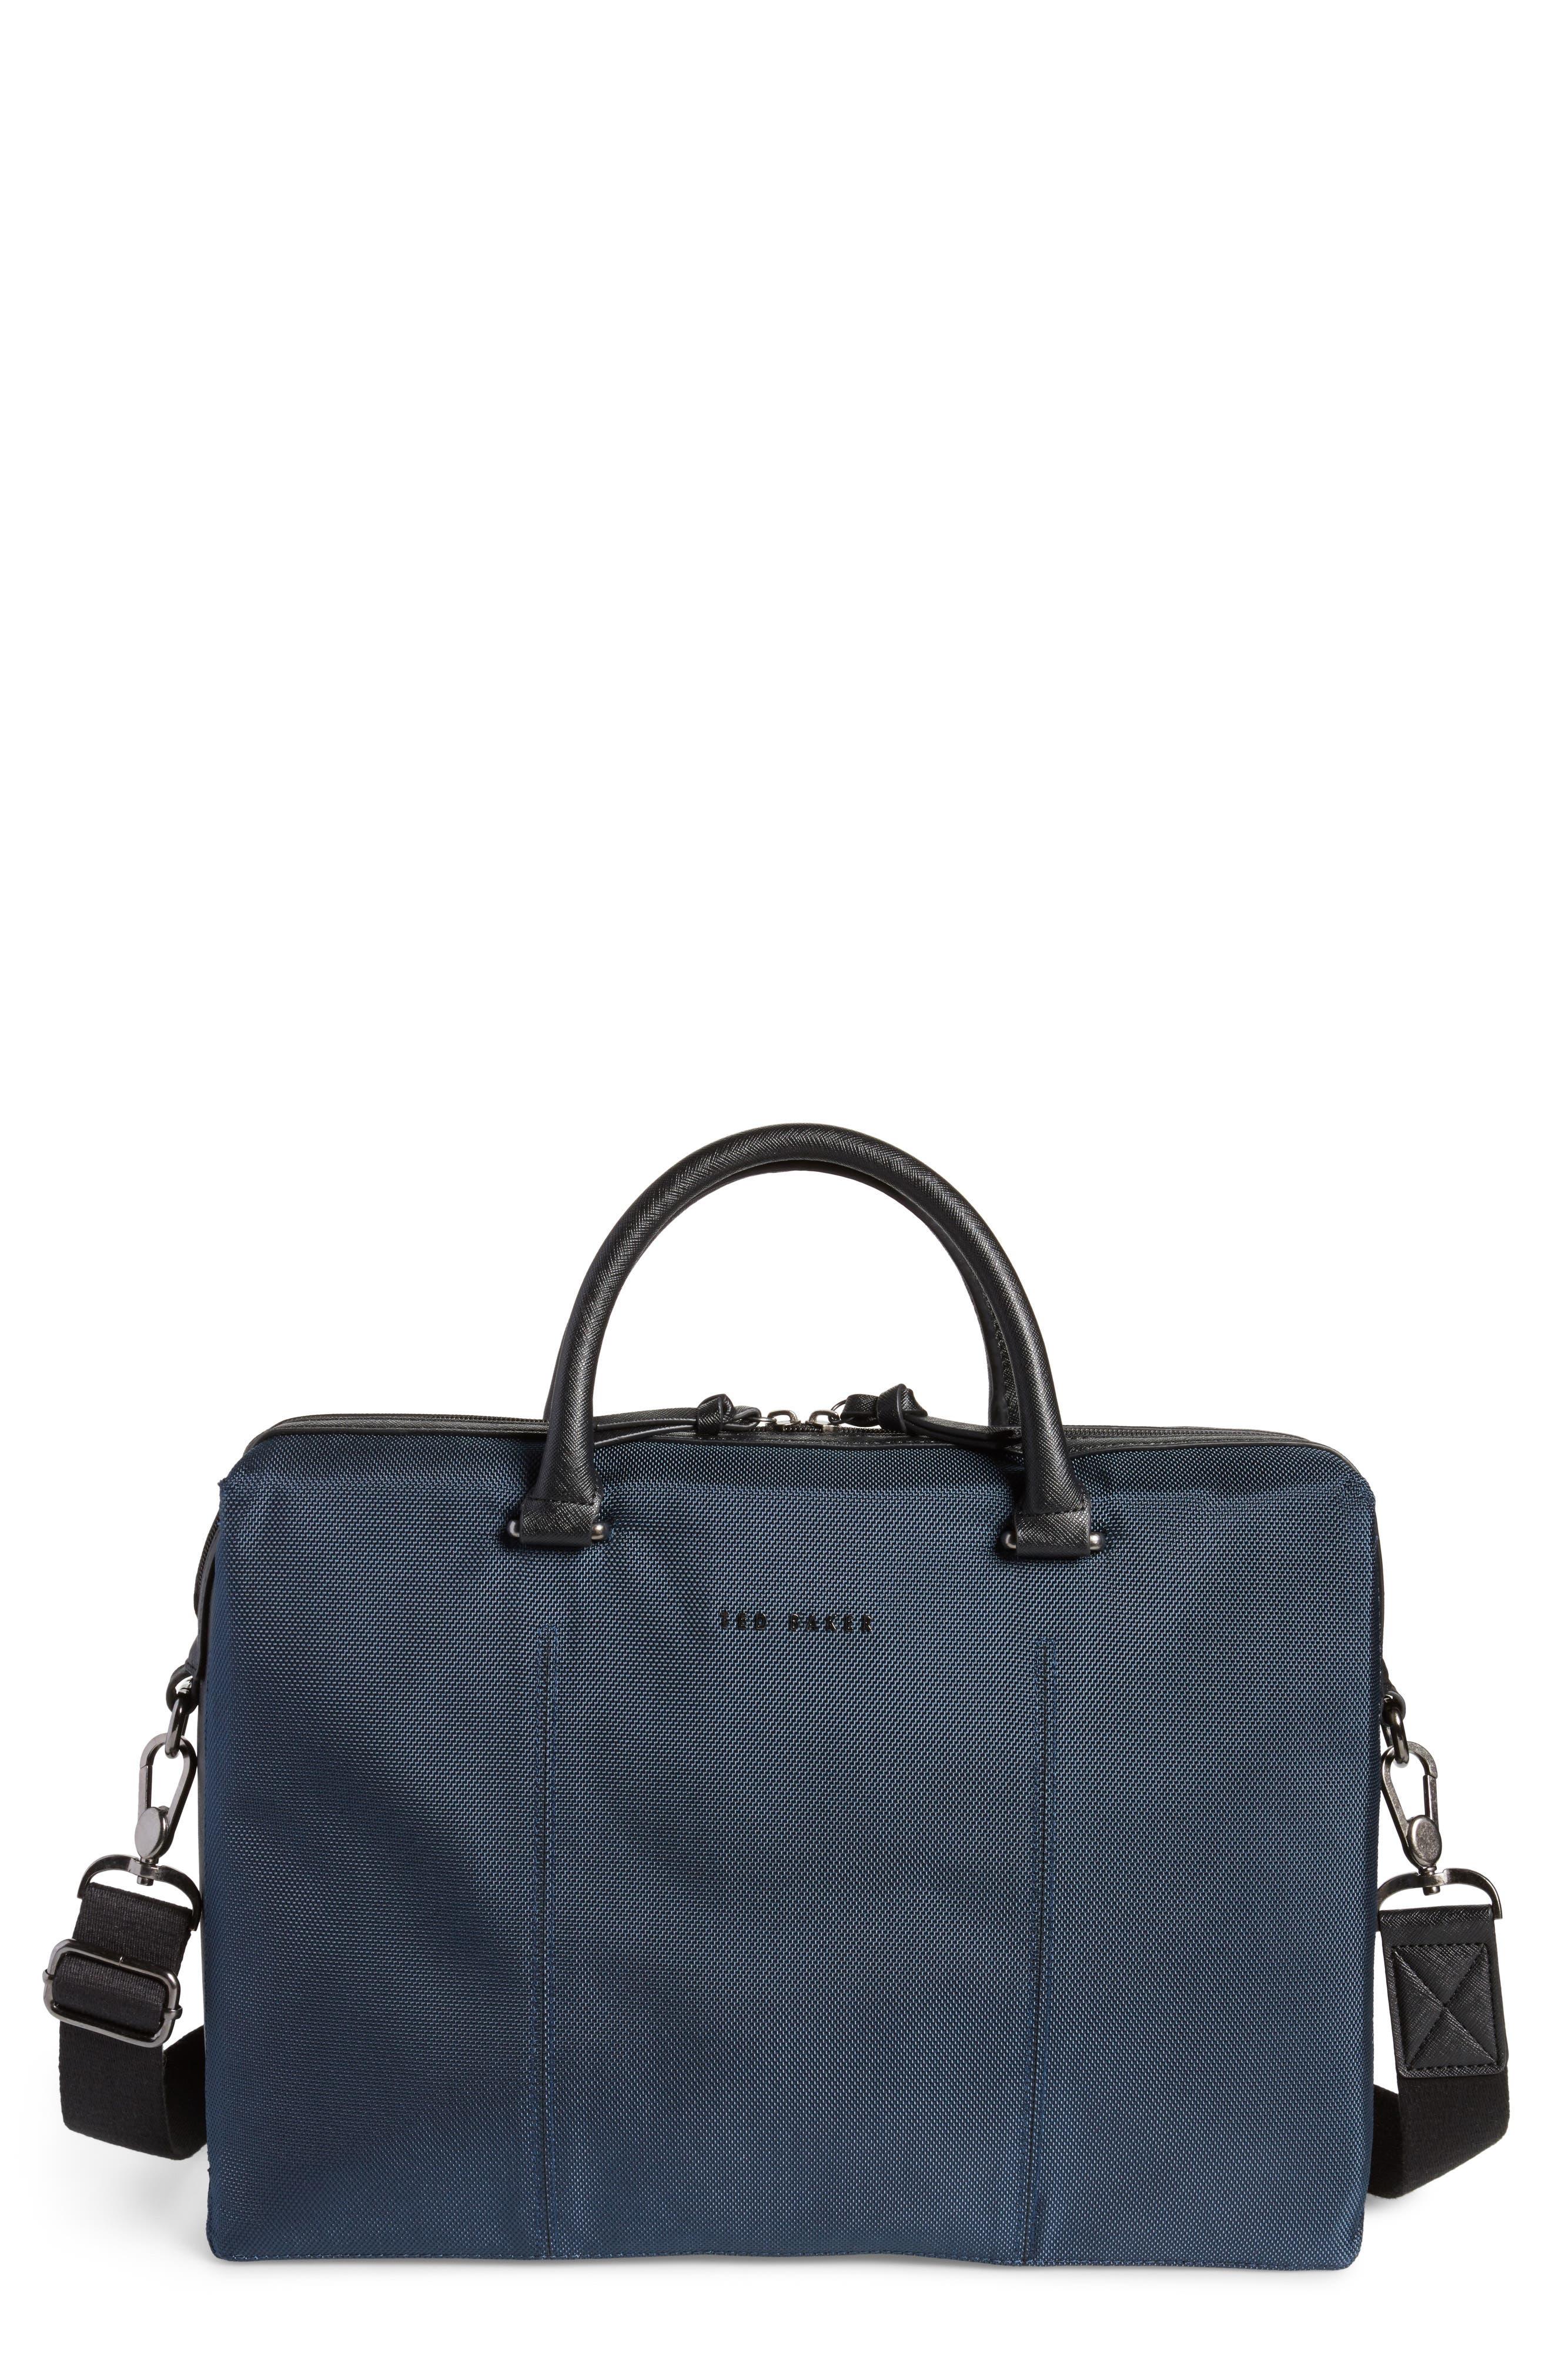 Document Bag,                         Main,                         color, 410